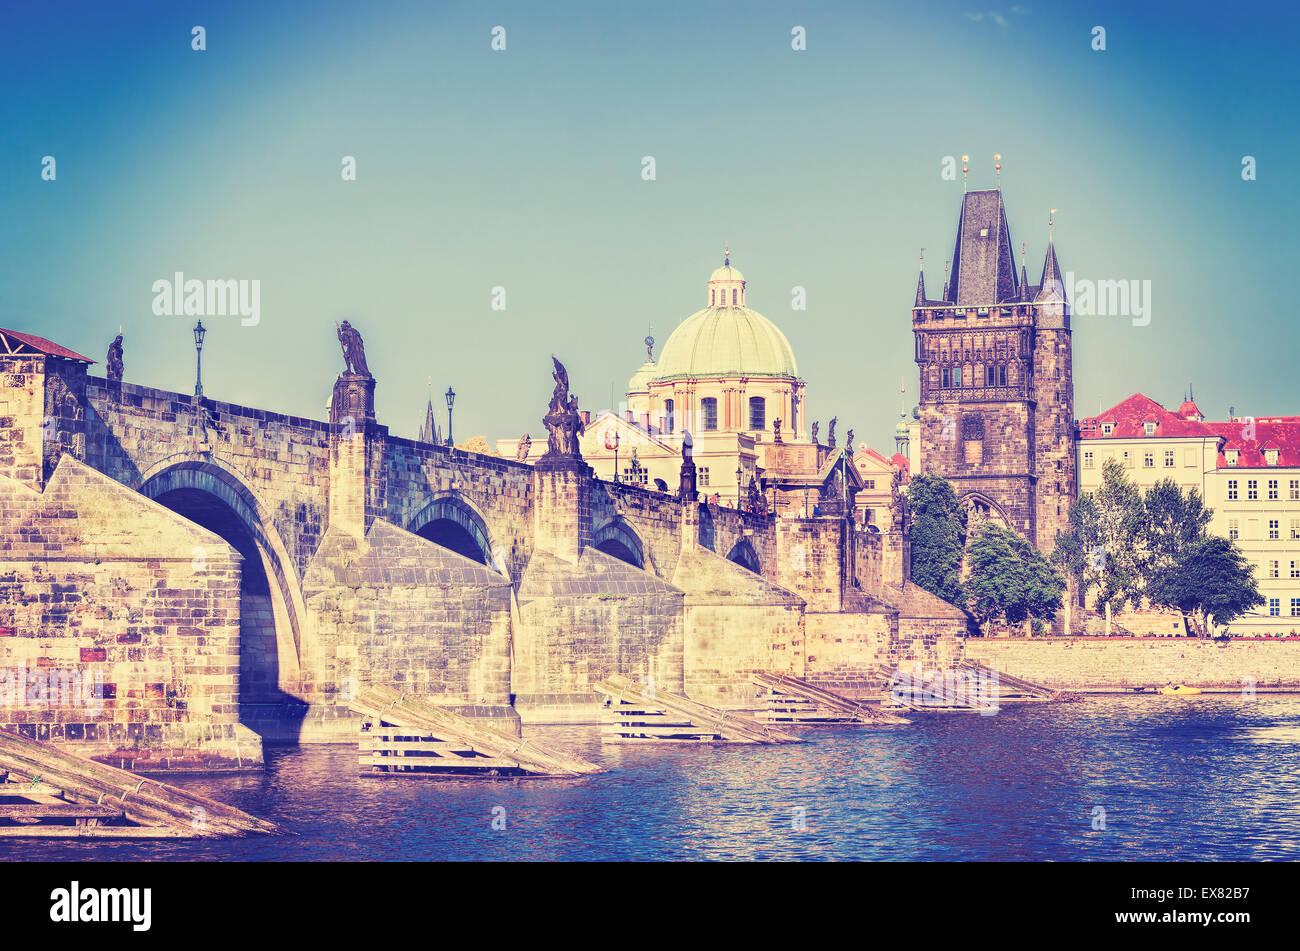 Retro instagram stylized picture of Prague, Charles bridge and Vltava river. - Stock Image